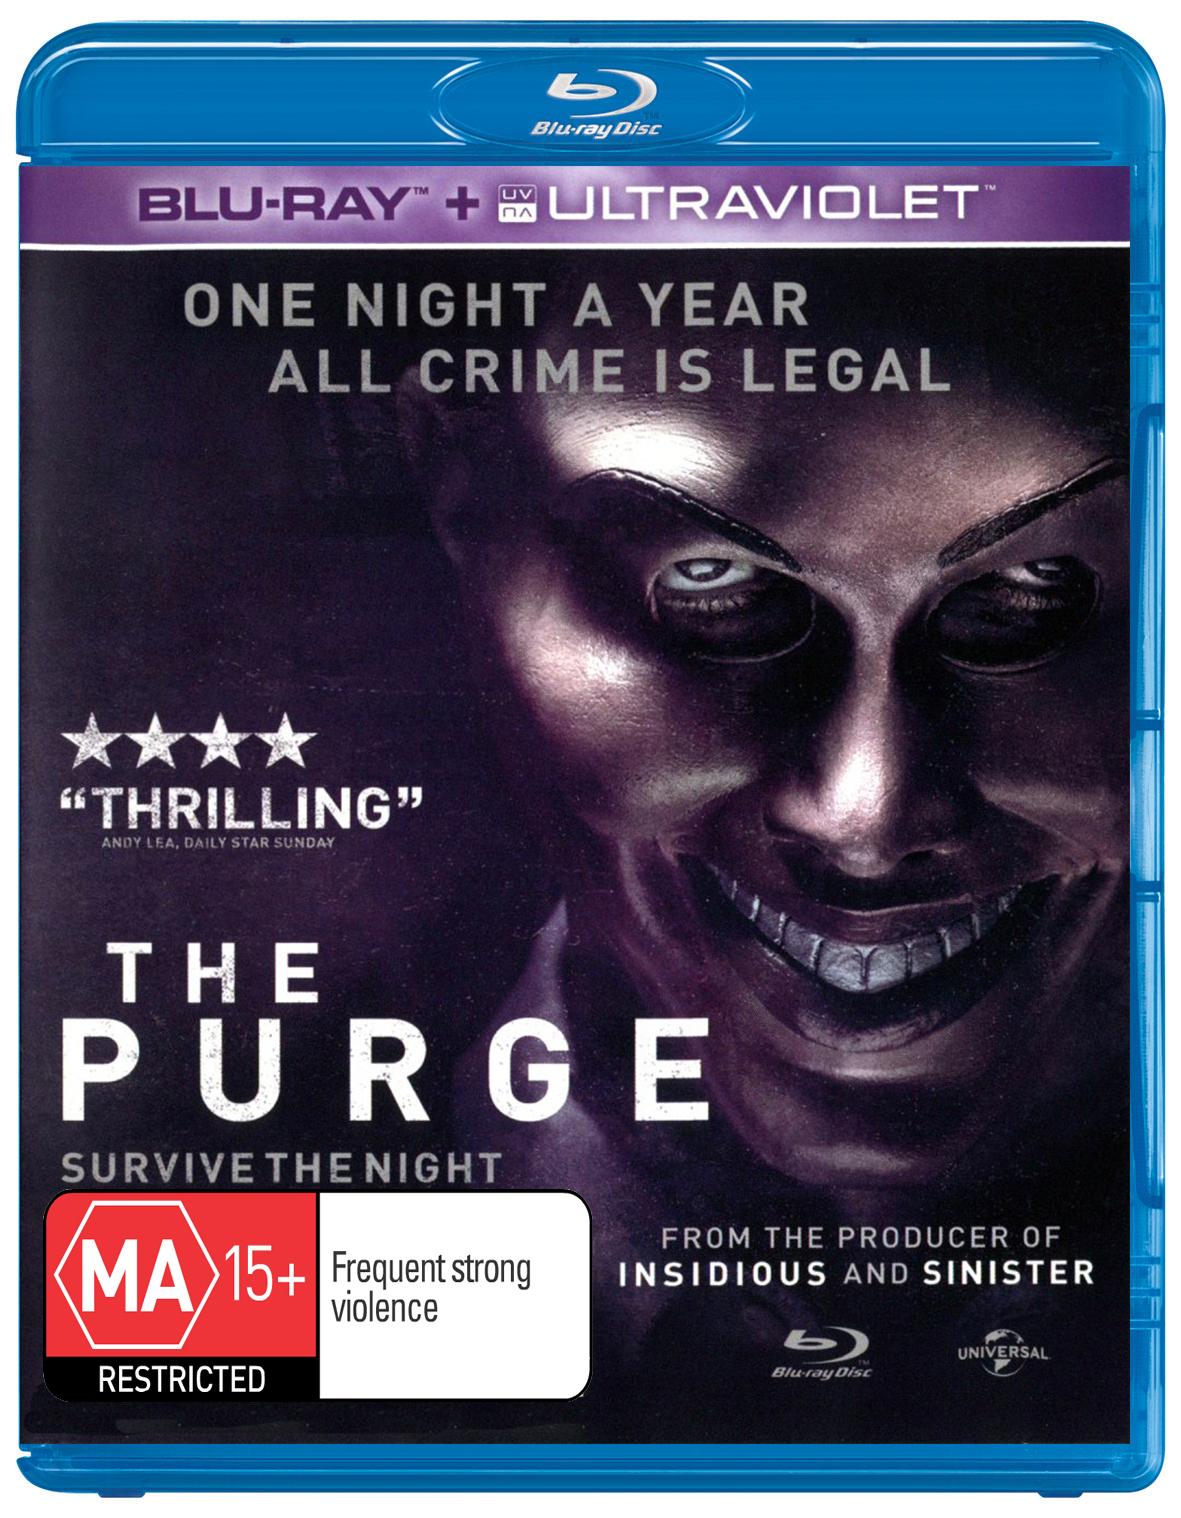 The Purge on Blu-ray, UV image